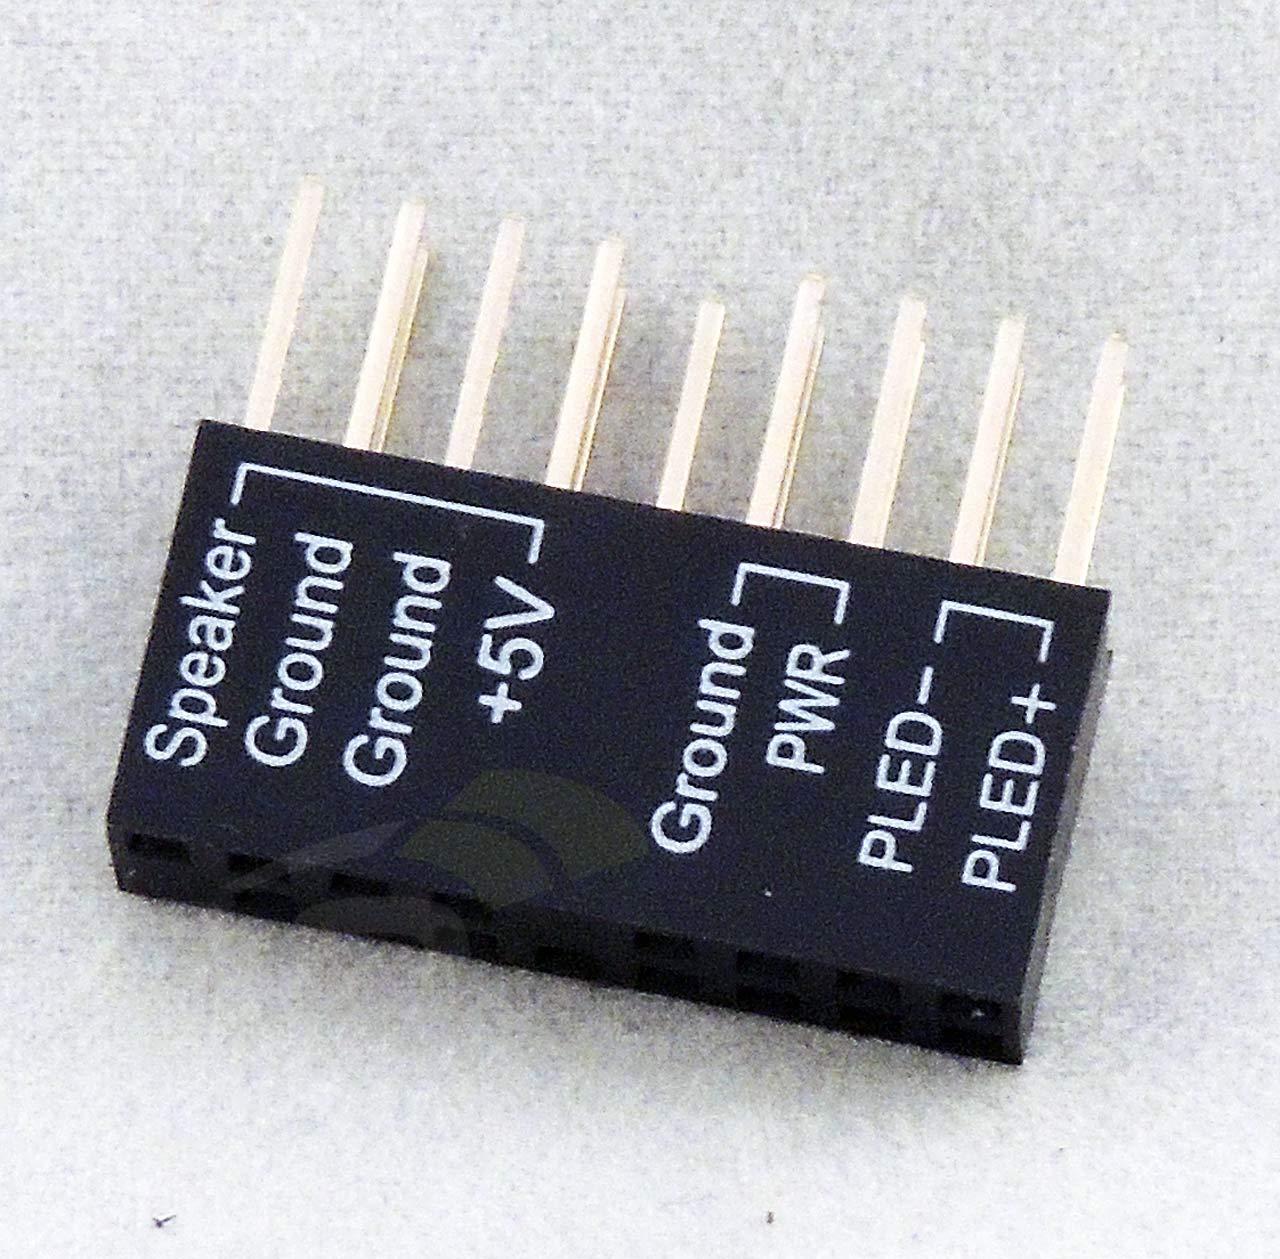 19-qconnector.jpg